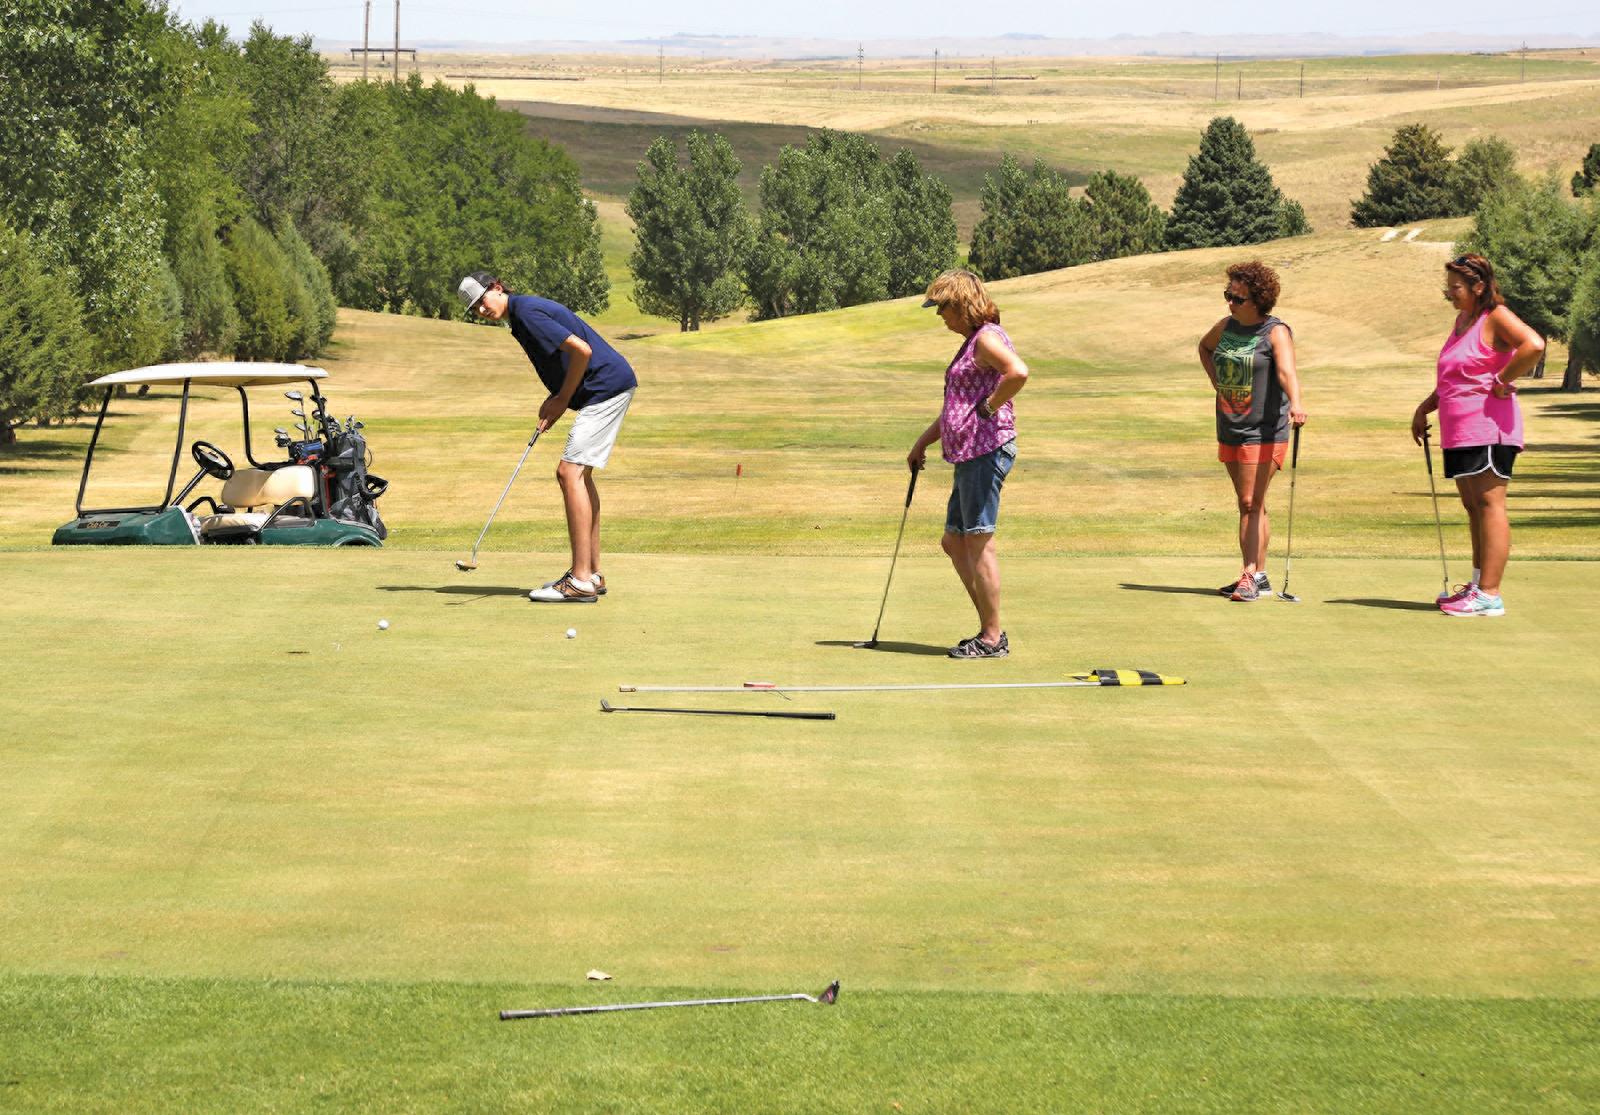 Golf-cmyk-4318.jpg